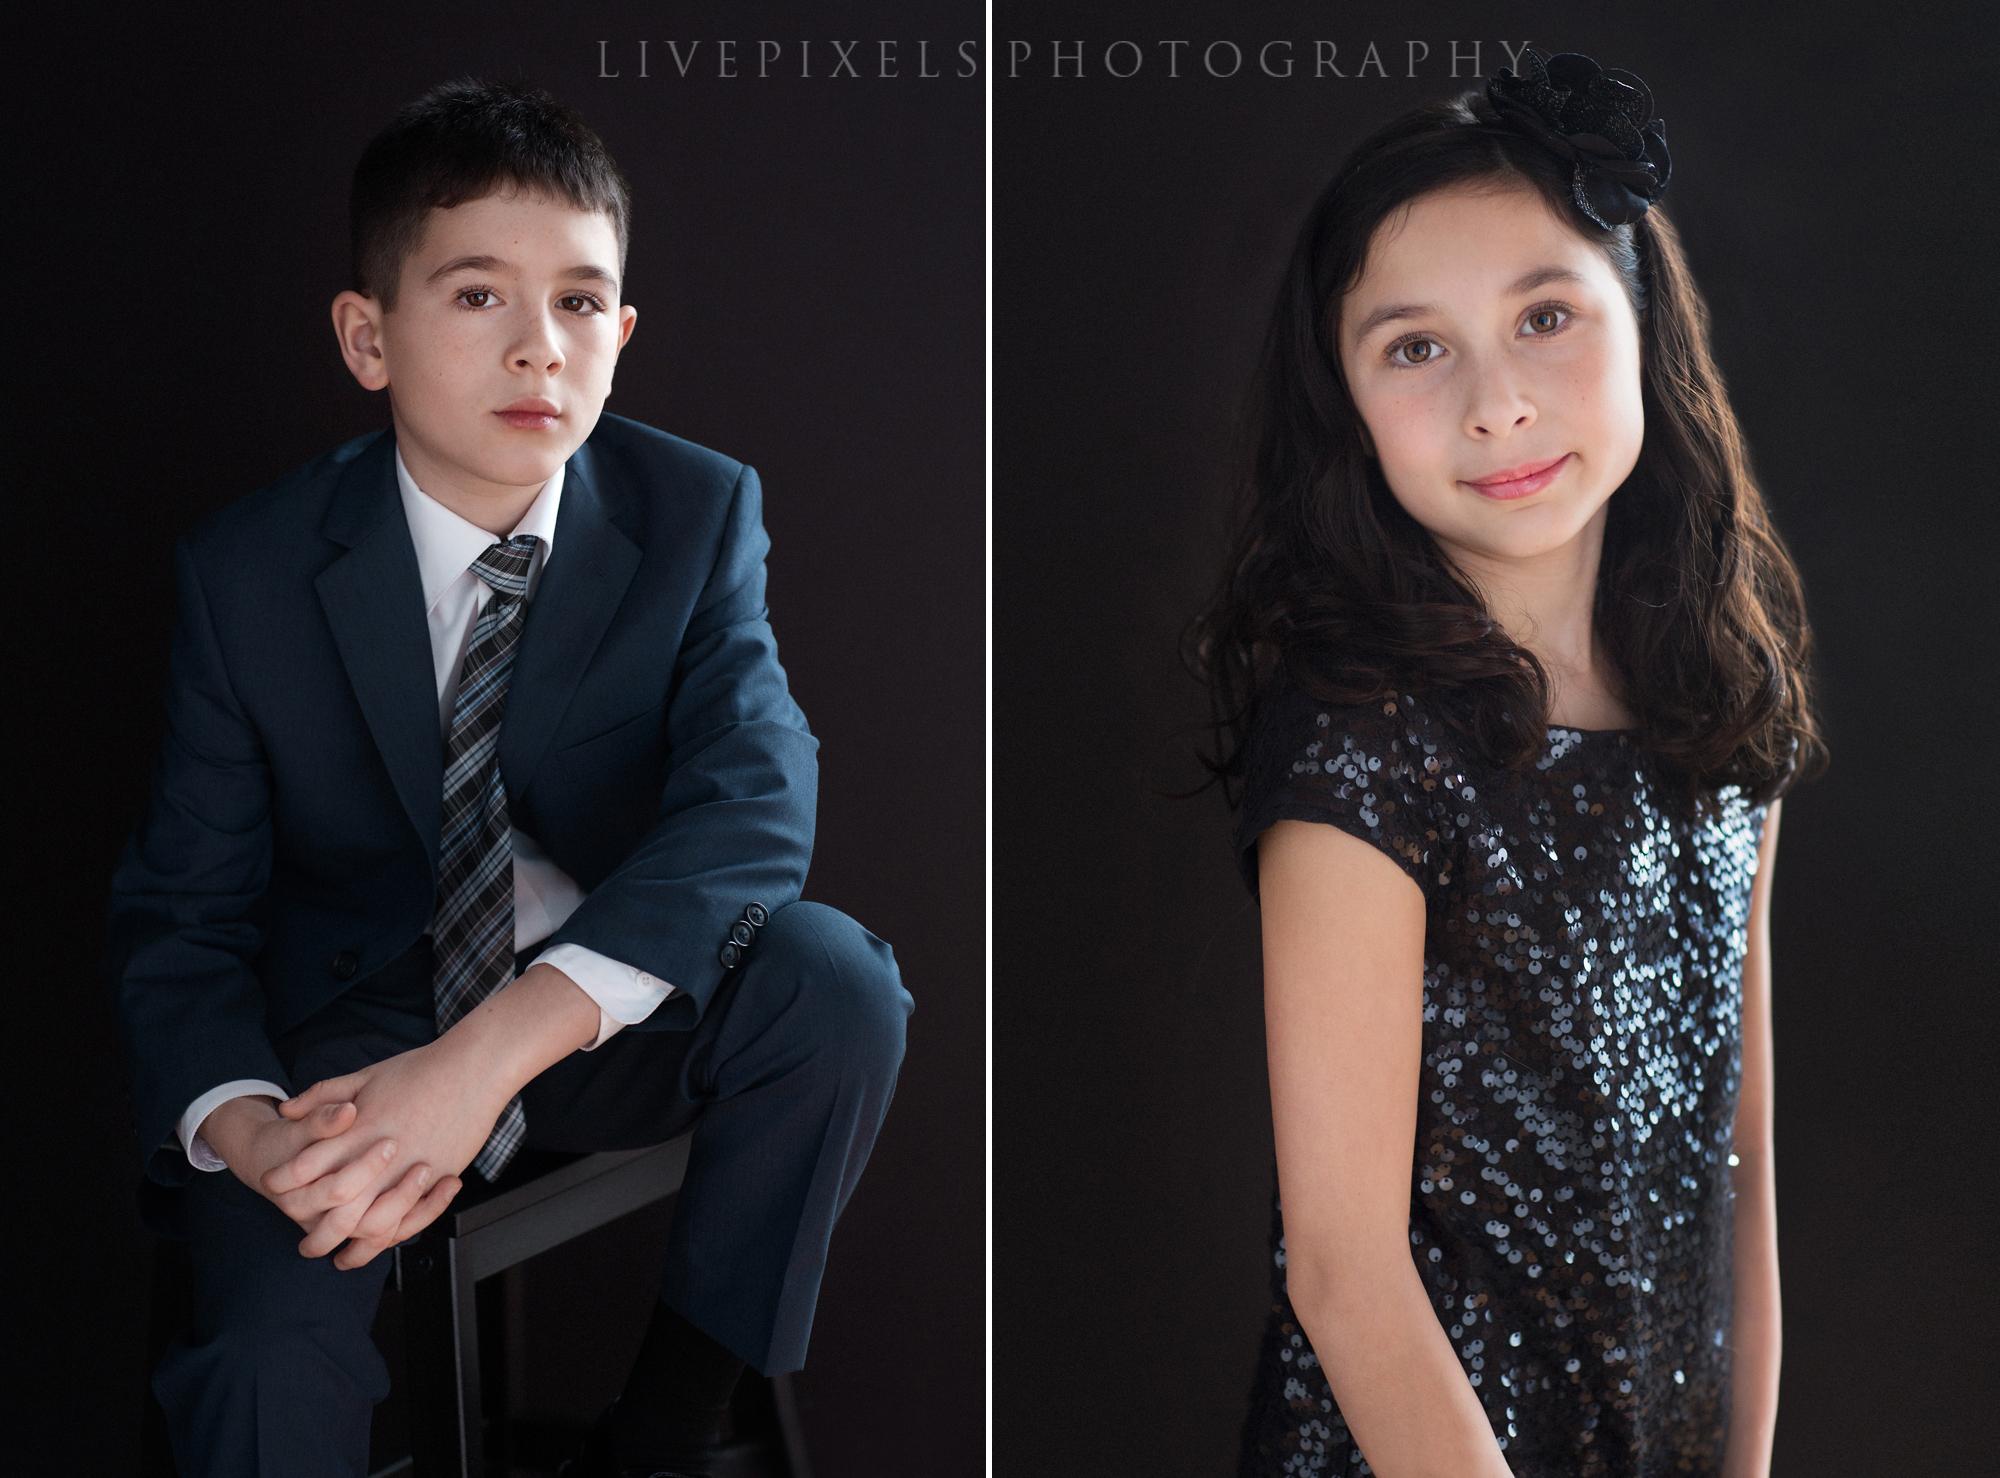 Toronto professional portrait studio